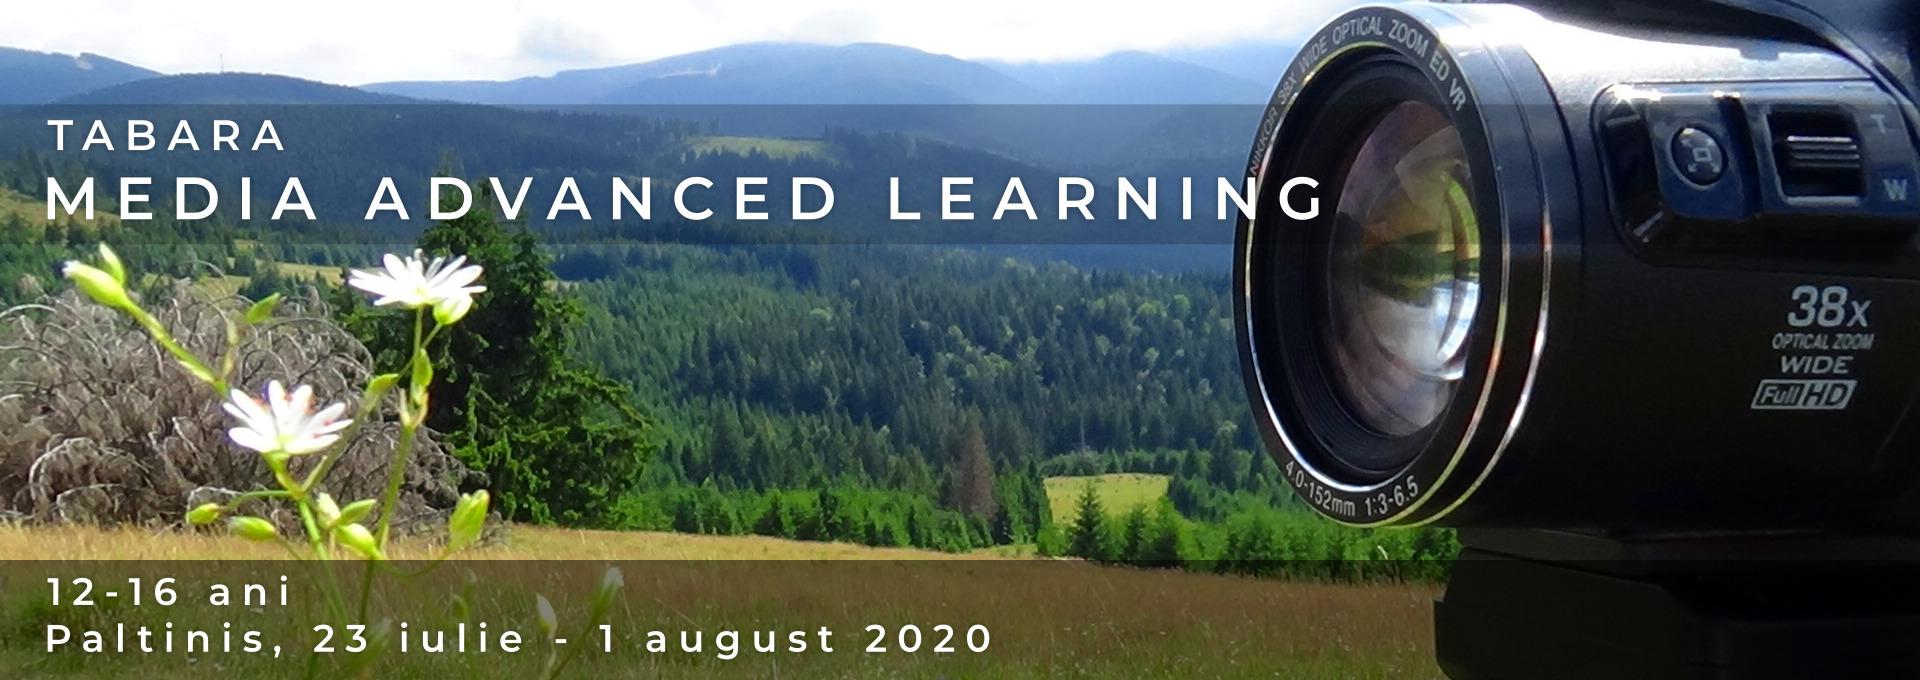 Tabara Media Advanced Learning Paltinis